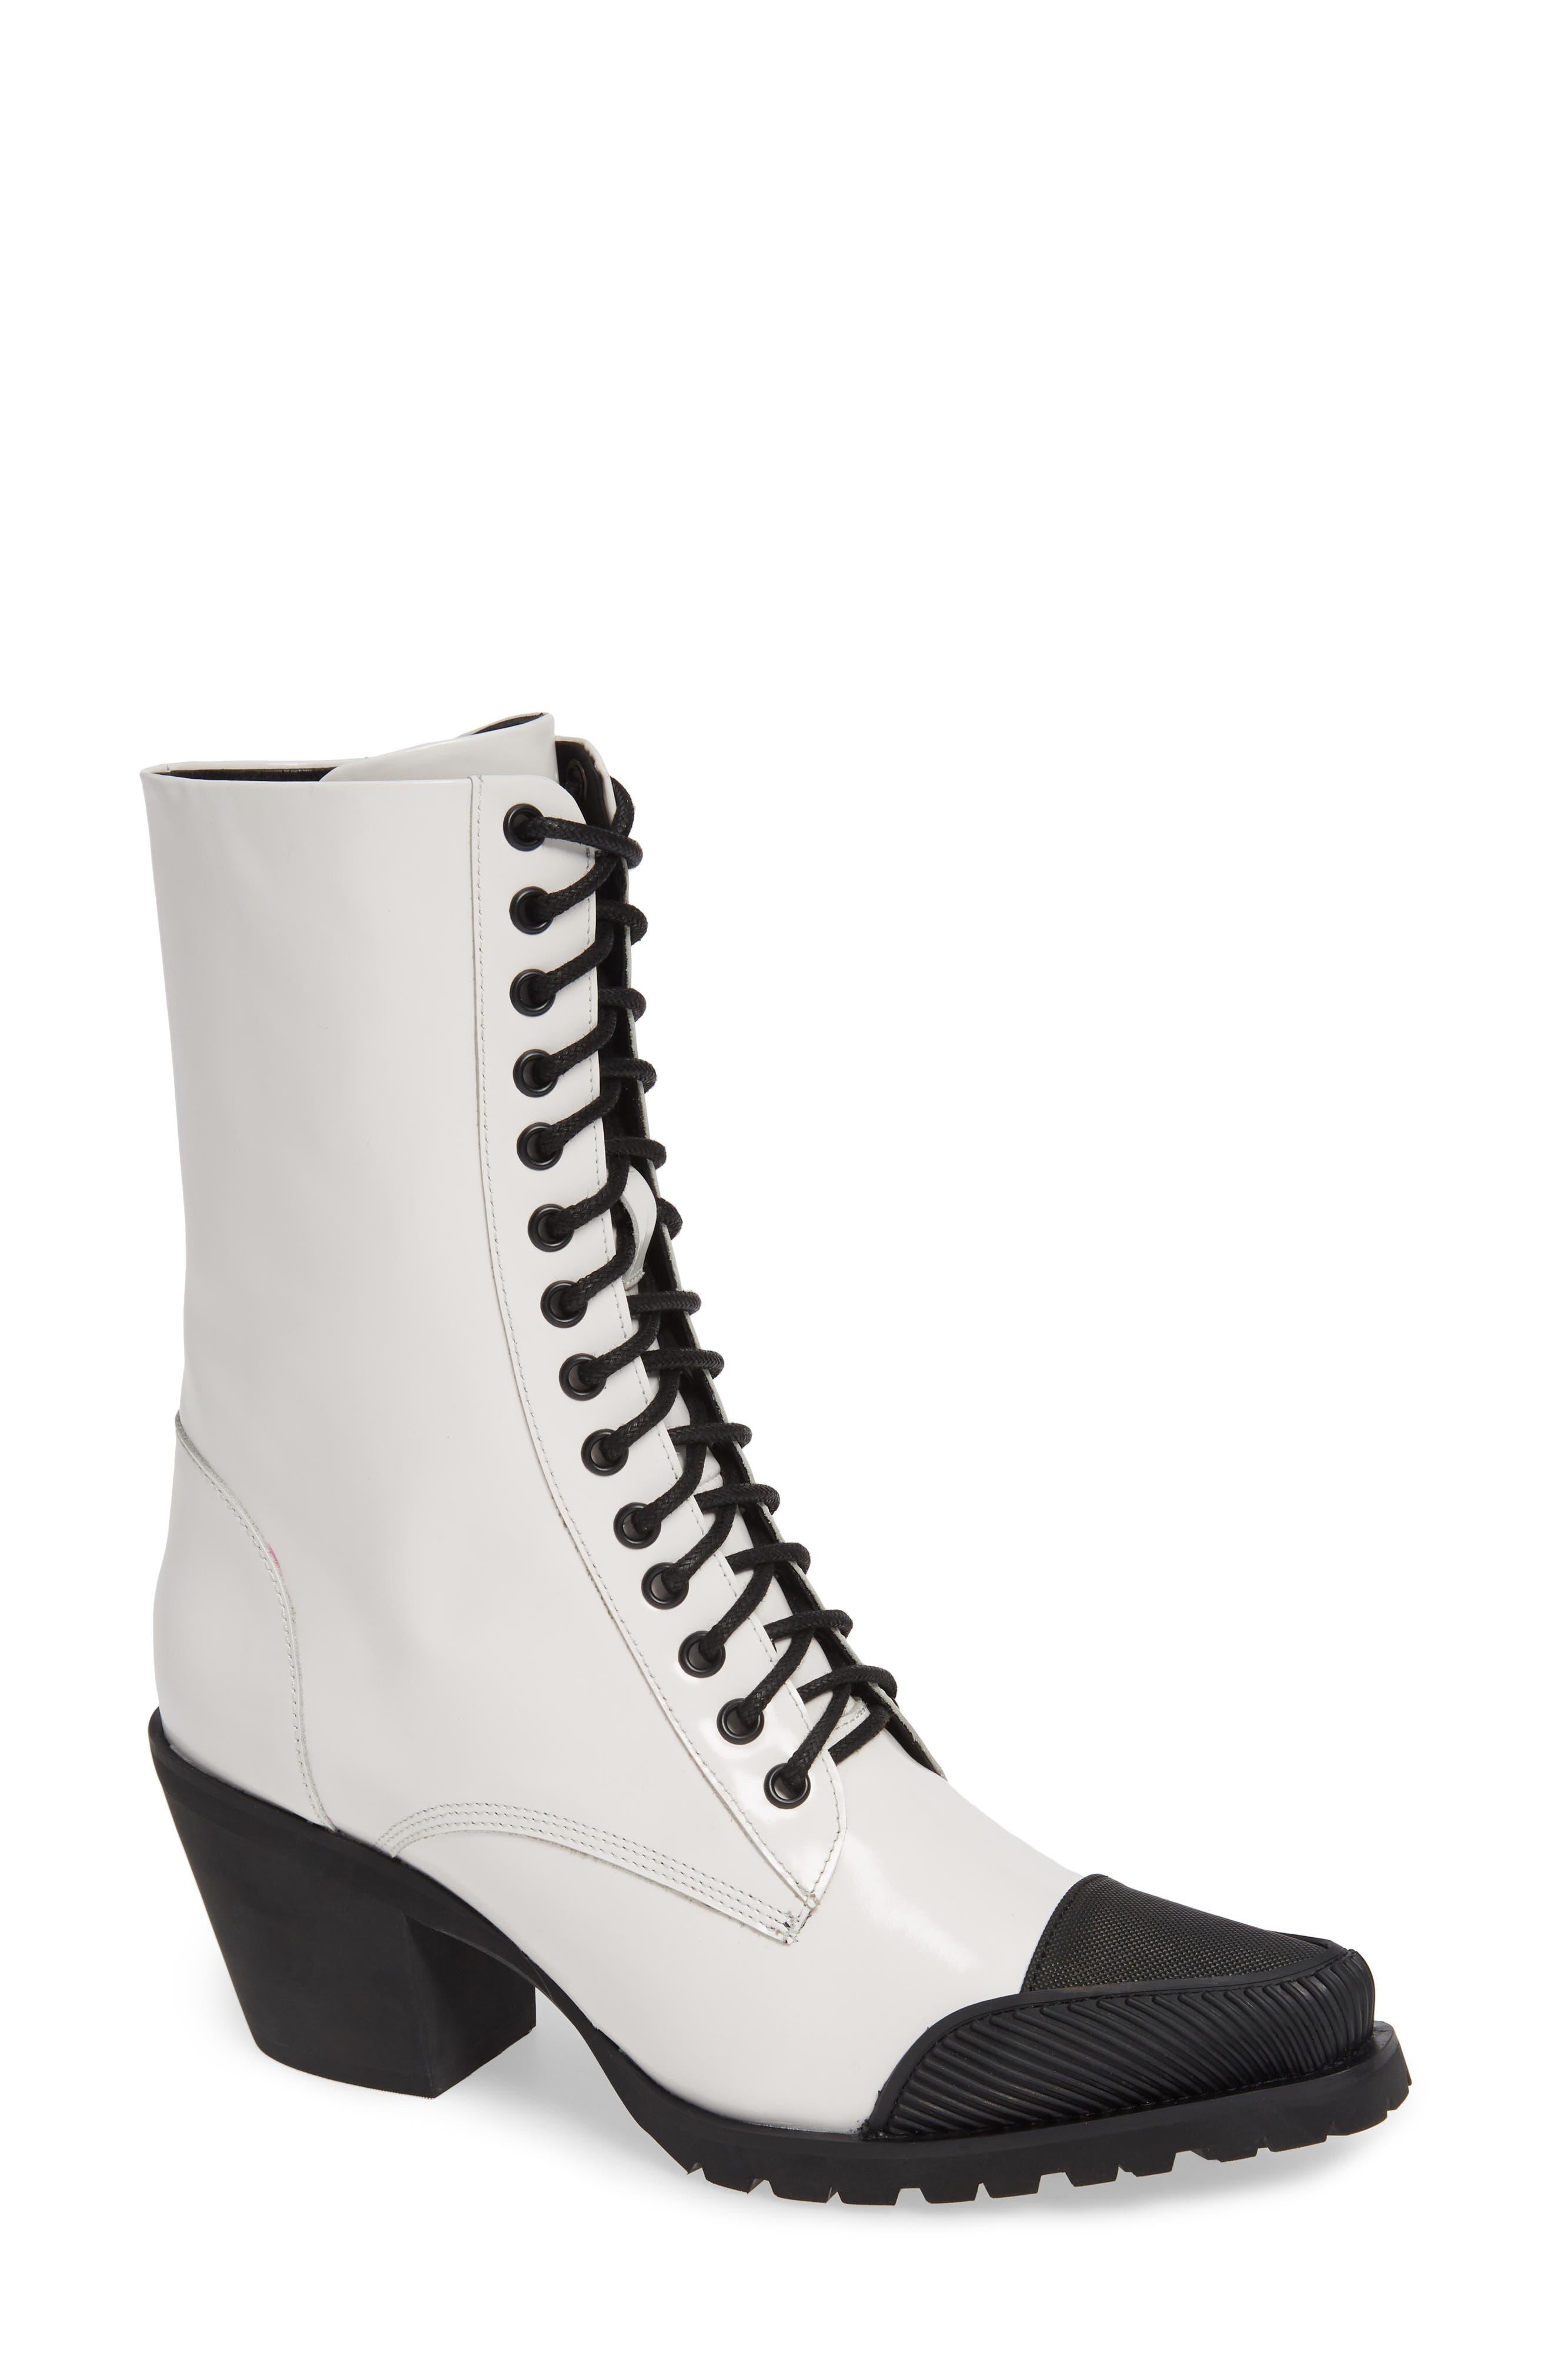 Jeffrey Campbell Vestal Boot, White